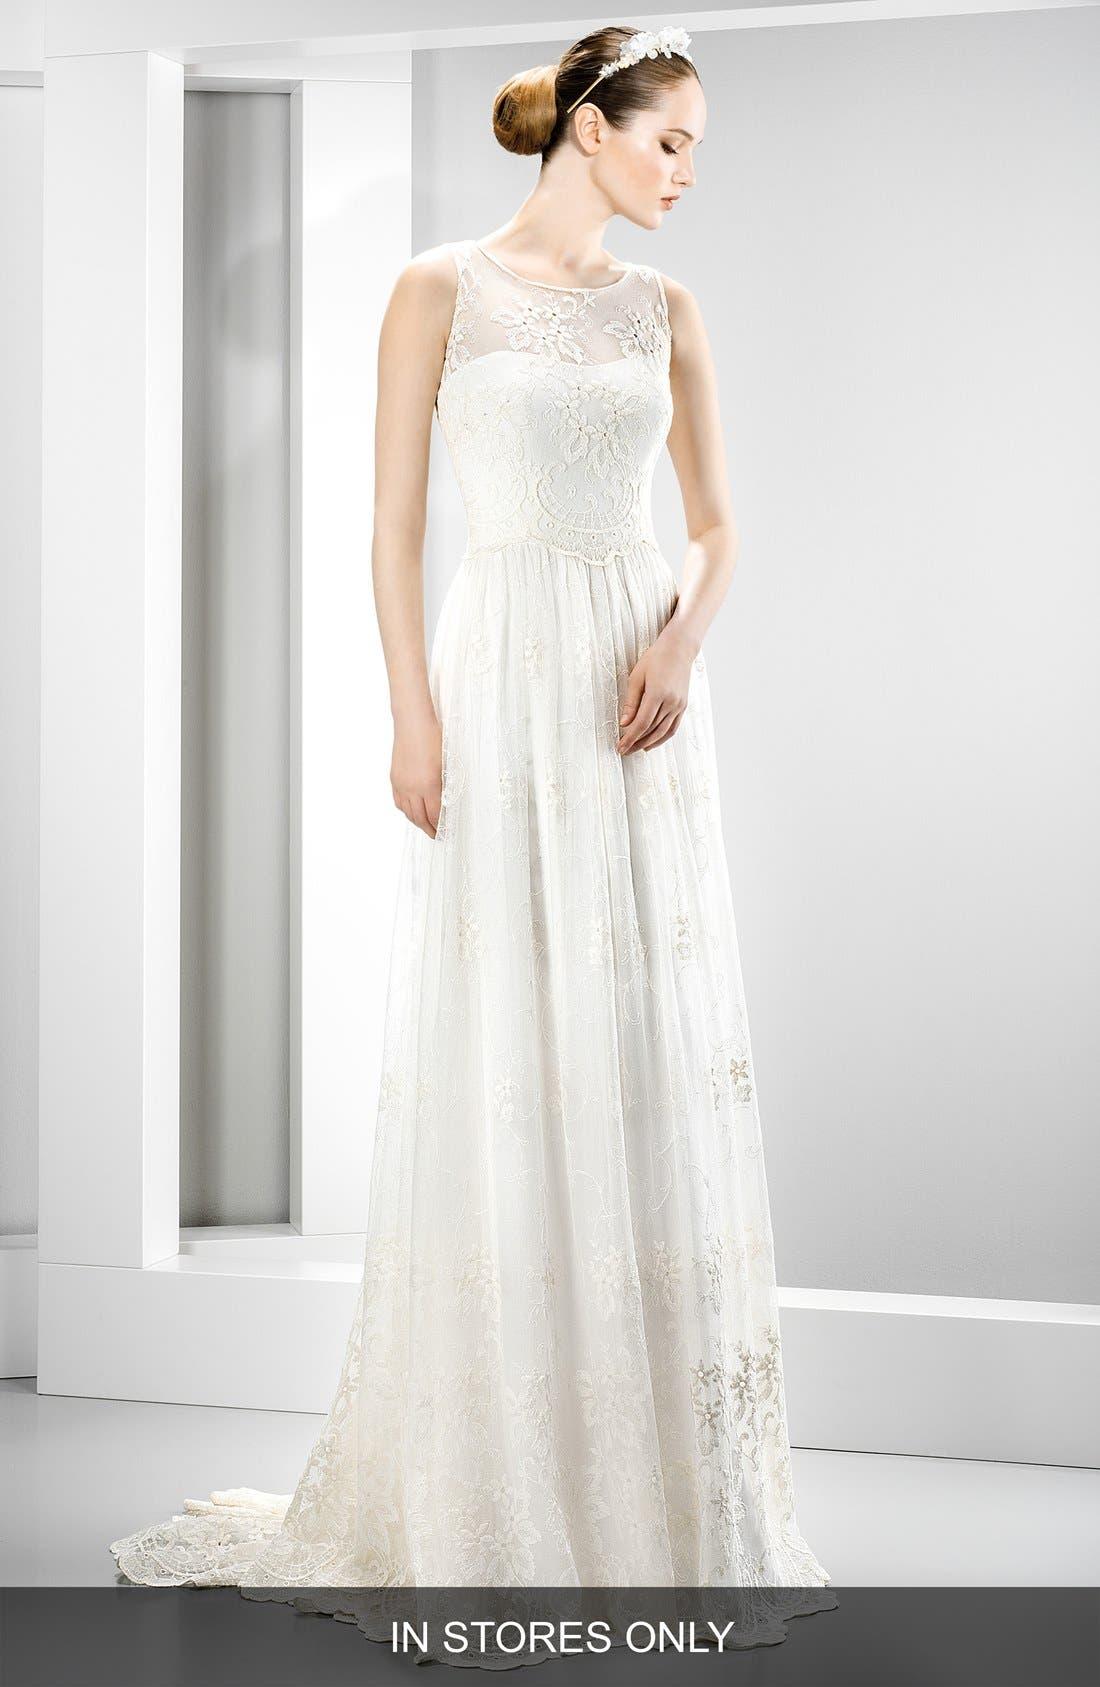 Illusion Lace Boho Dress,                             Main thumbnail 1, color,